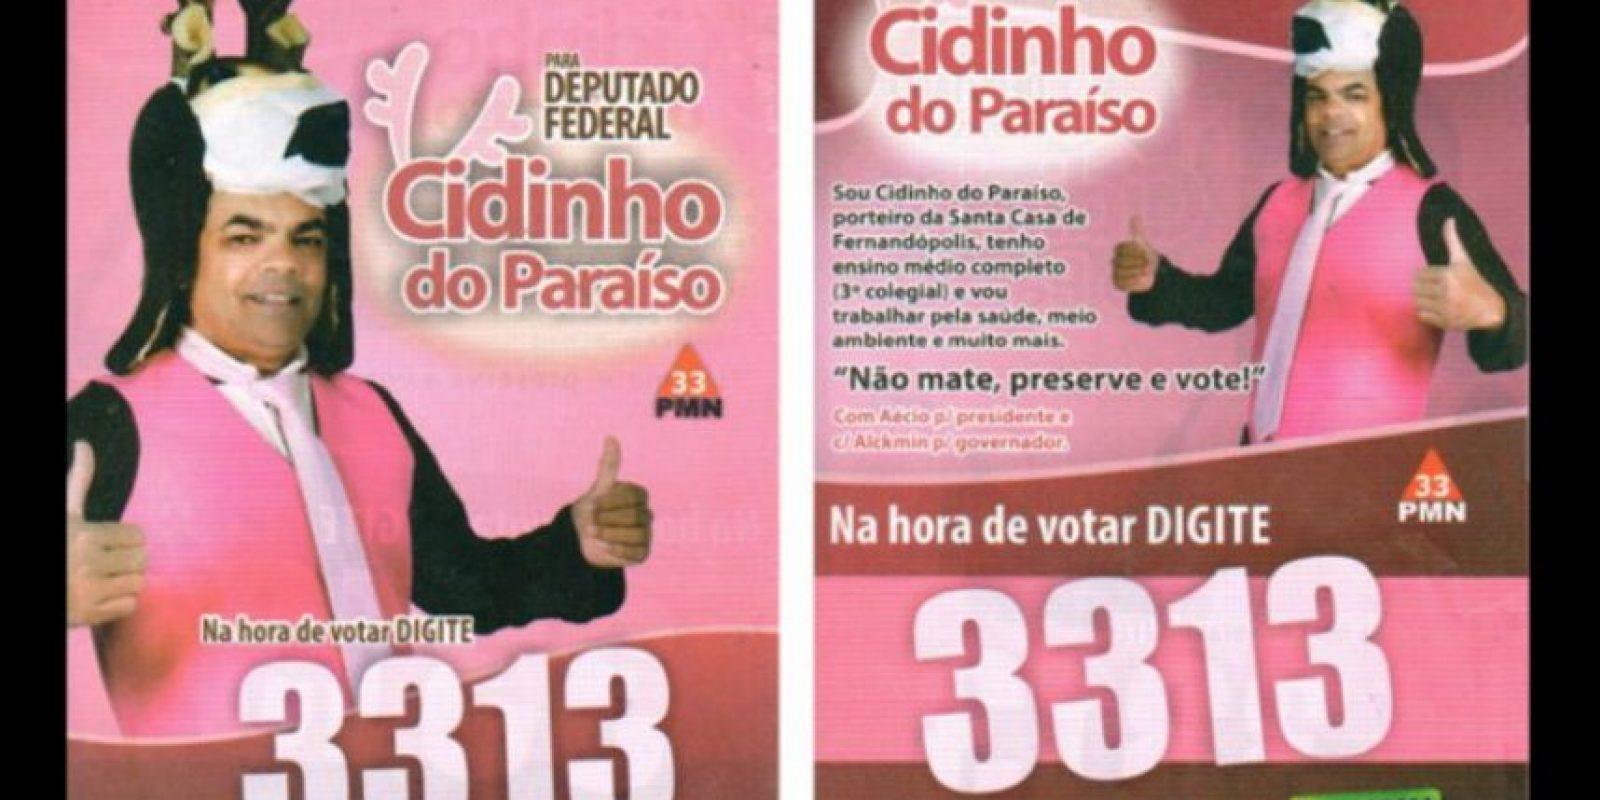 Elecciones de Brasil Foto: Naosalvo.com.br